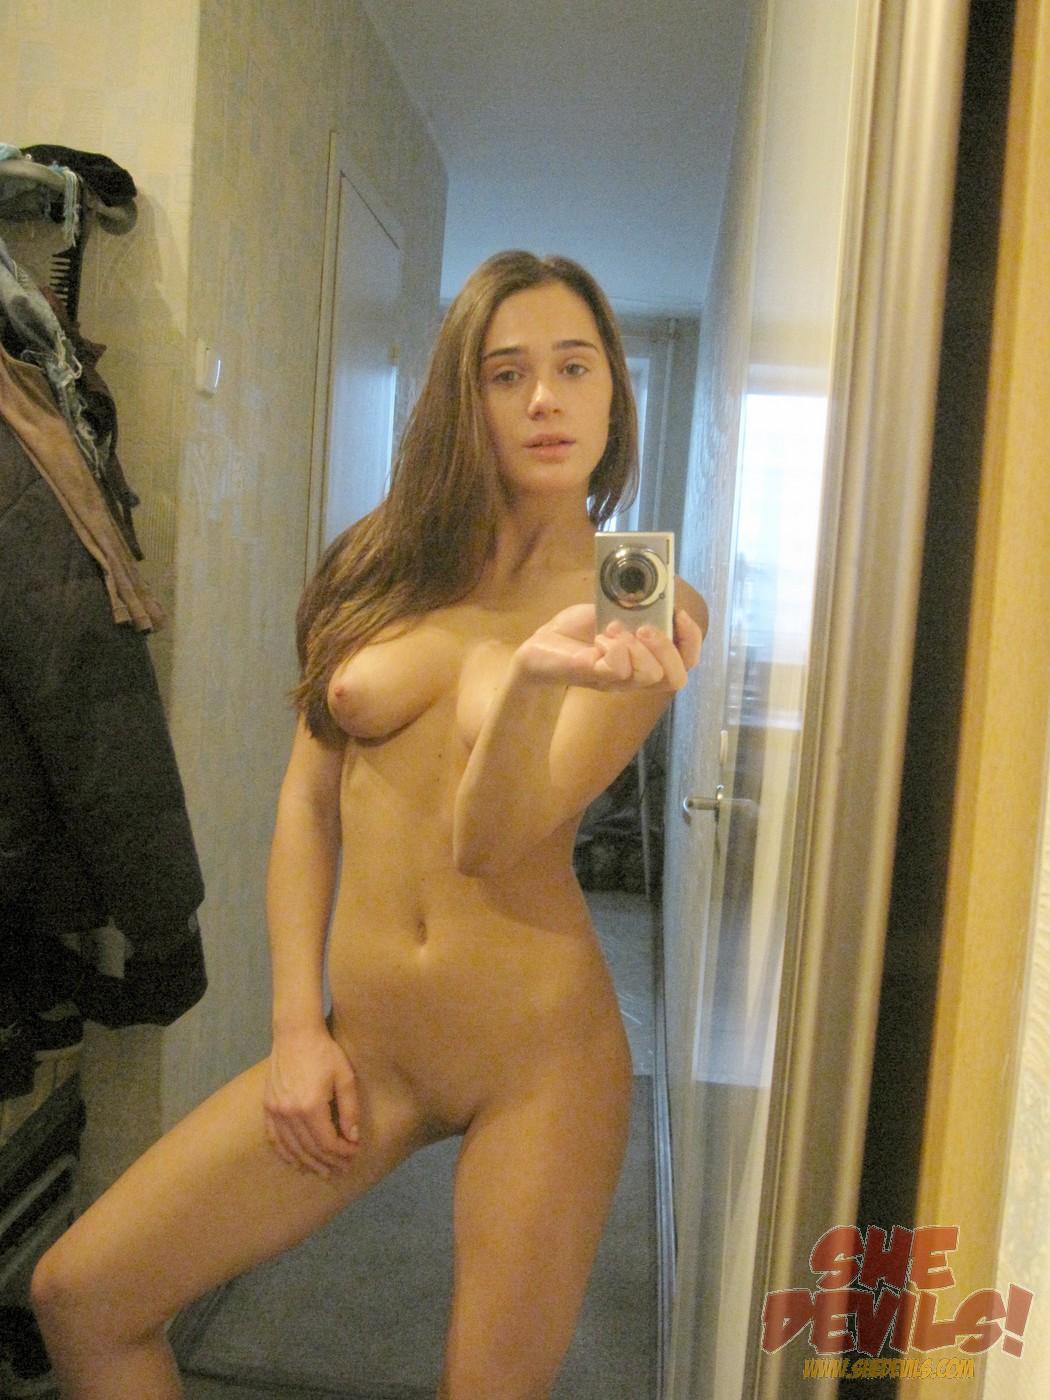 girls grabbing penis naked